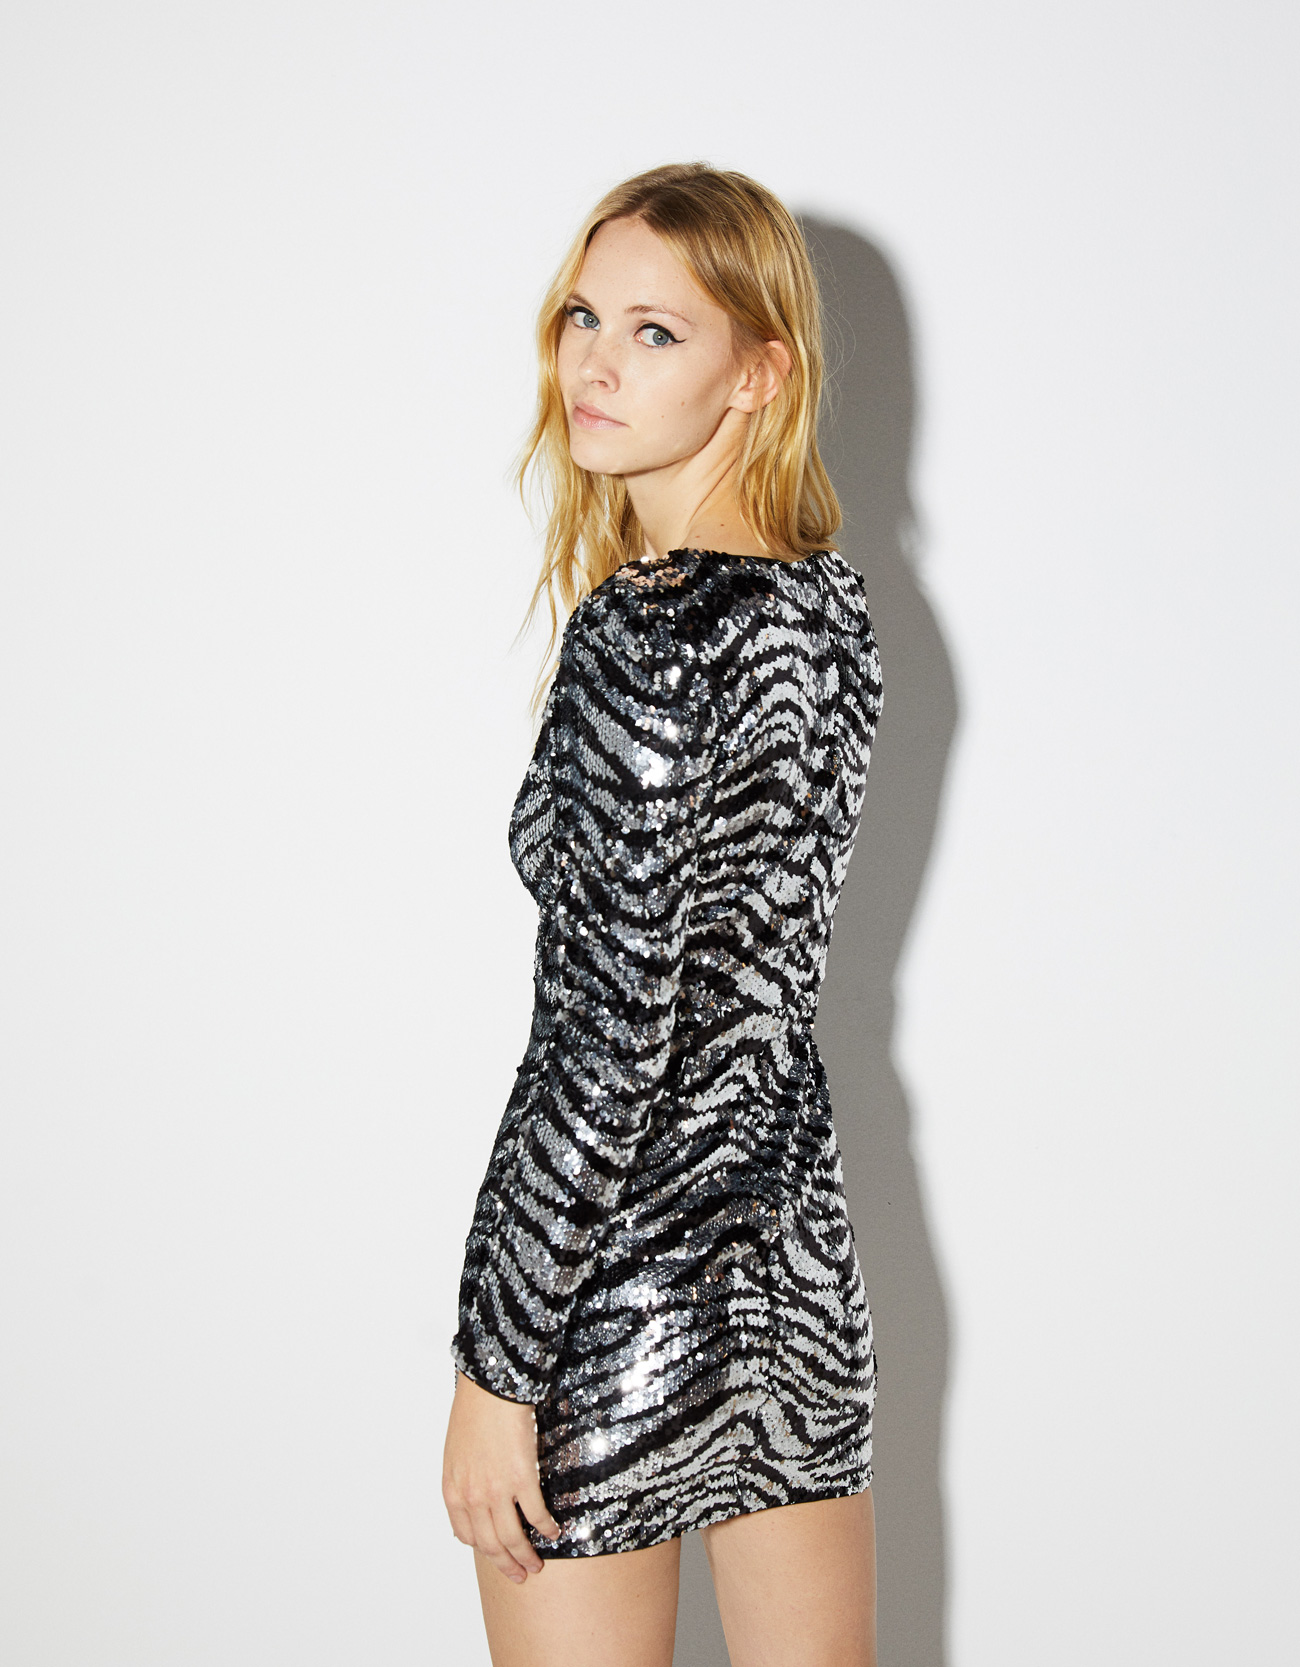 19ea84dc Sequinned zebra print dress - Micro Site Influencer - Bershka Armenia